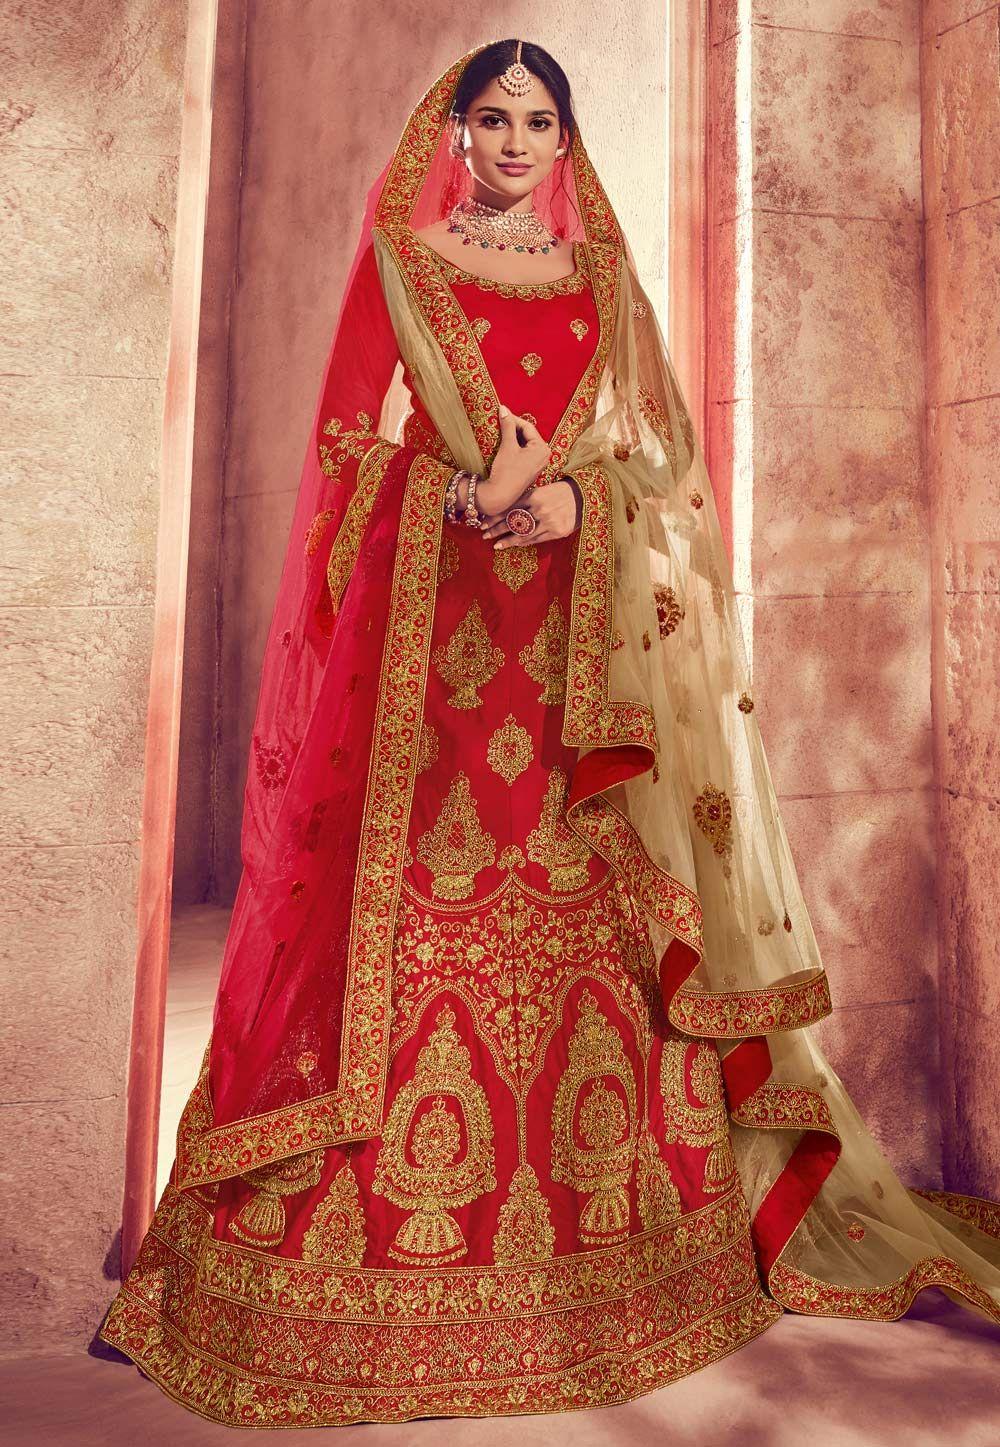 af0f32c710 Buy Red Art Silk Bridal Lehenga Choli 162343 online at best price from vast  collection of Lehenga Choli and Chaniya Choli at Indianclothstore.com.